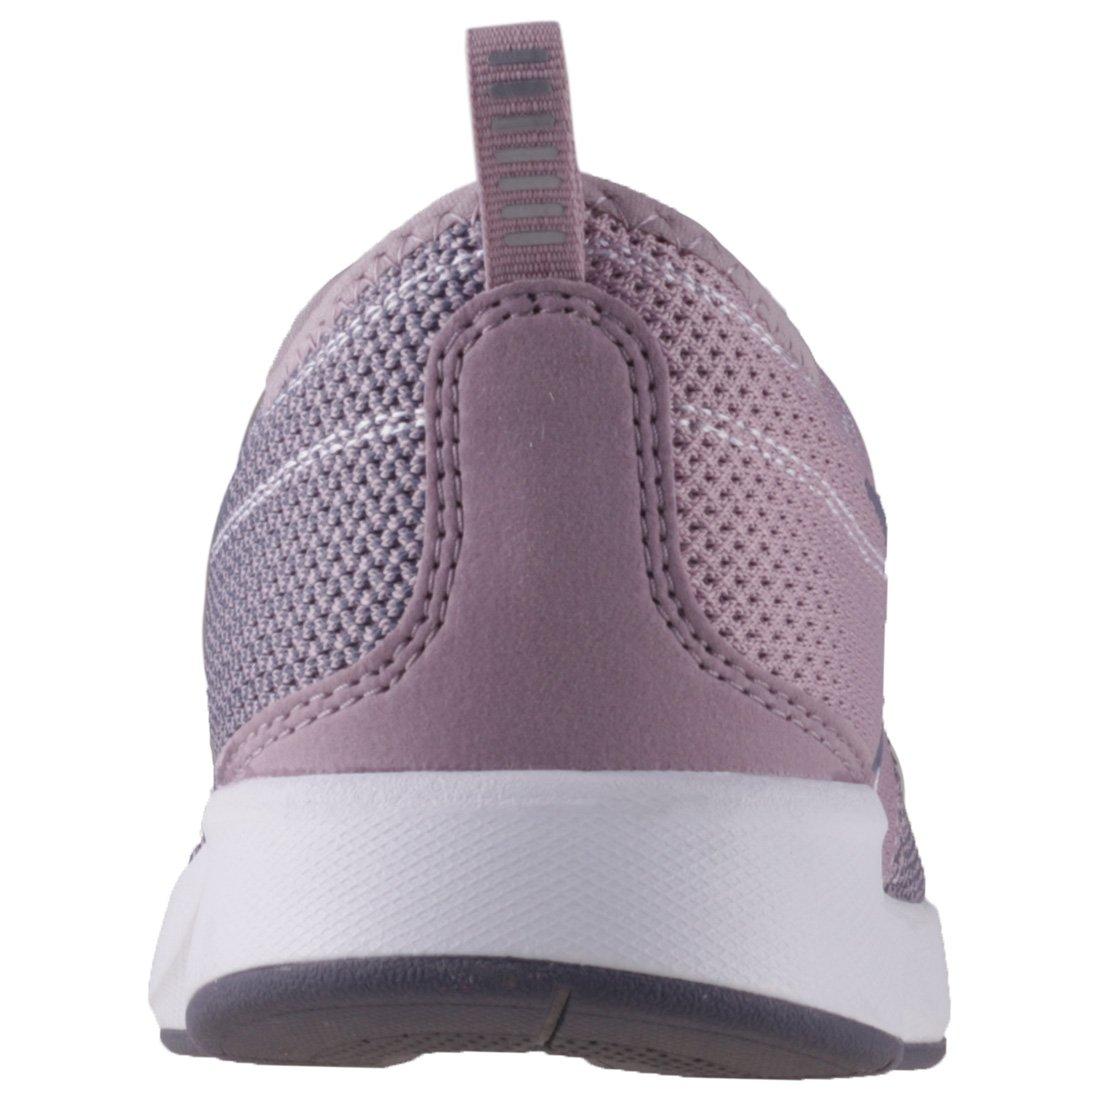 Nike Dualtone Racer Damen Turnschuhe 917682 Rosa Größe 38.5 EU Rosa 917682 (Rosa) be9366